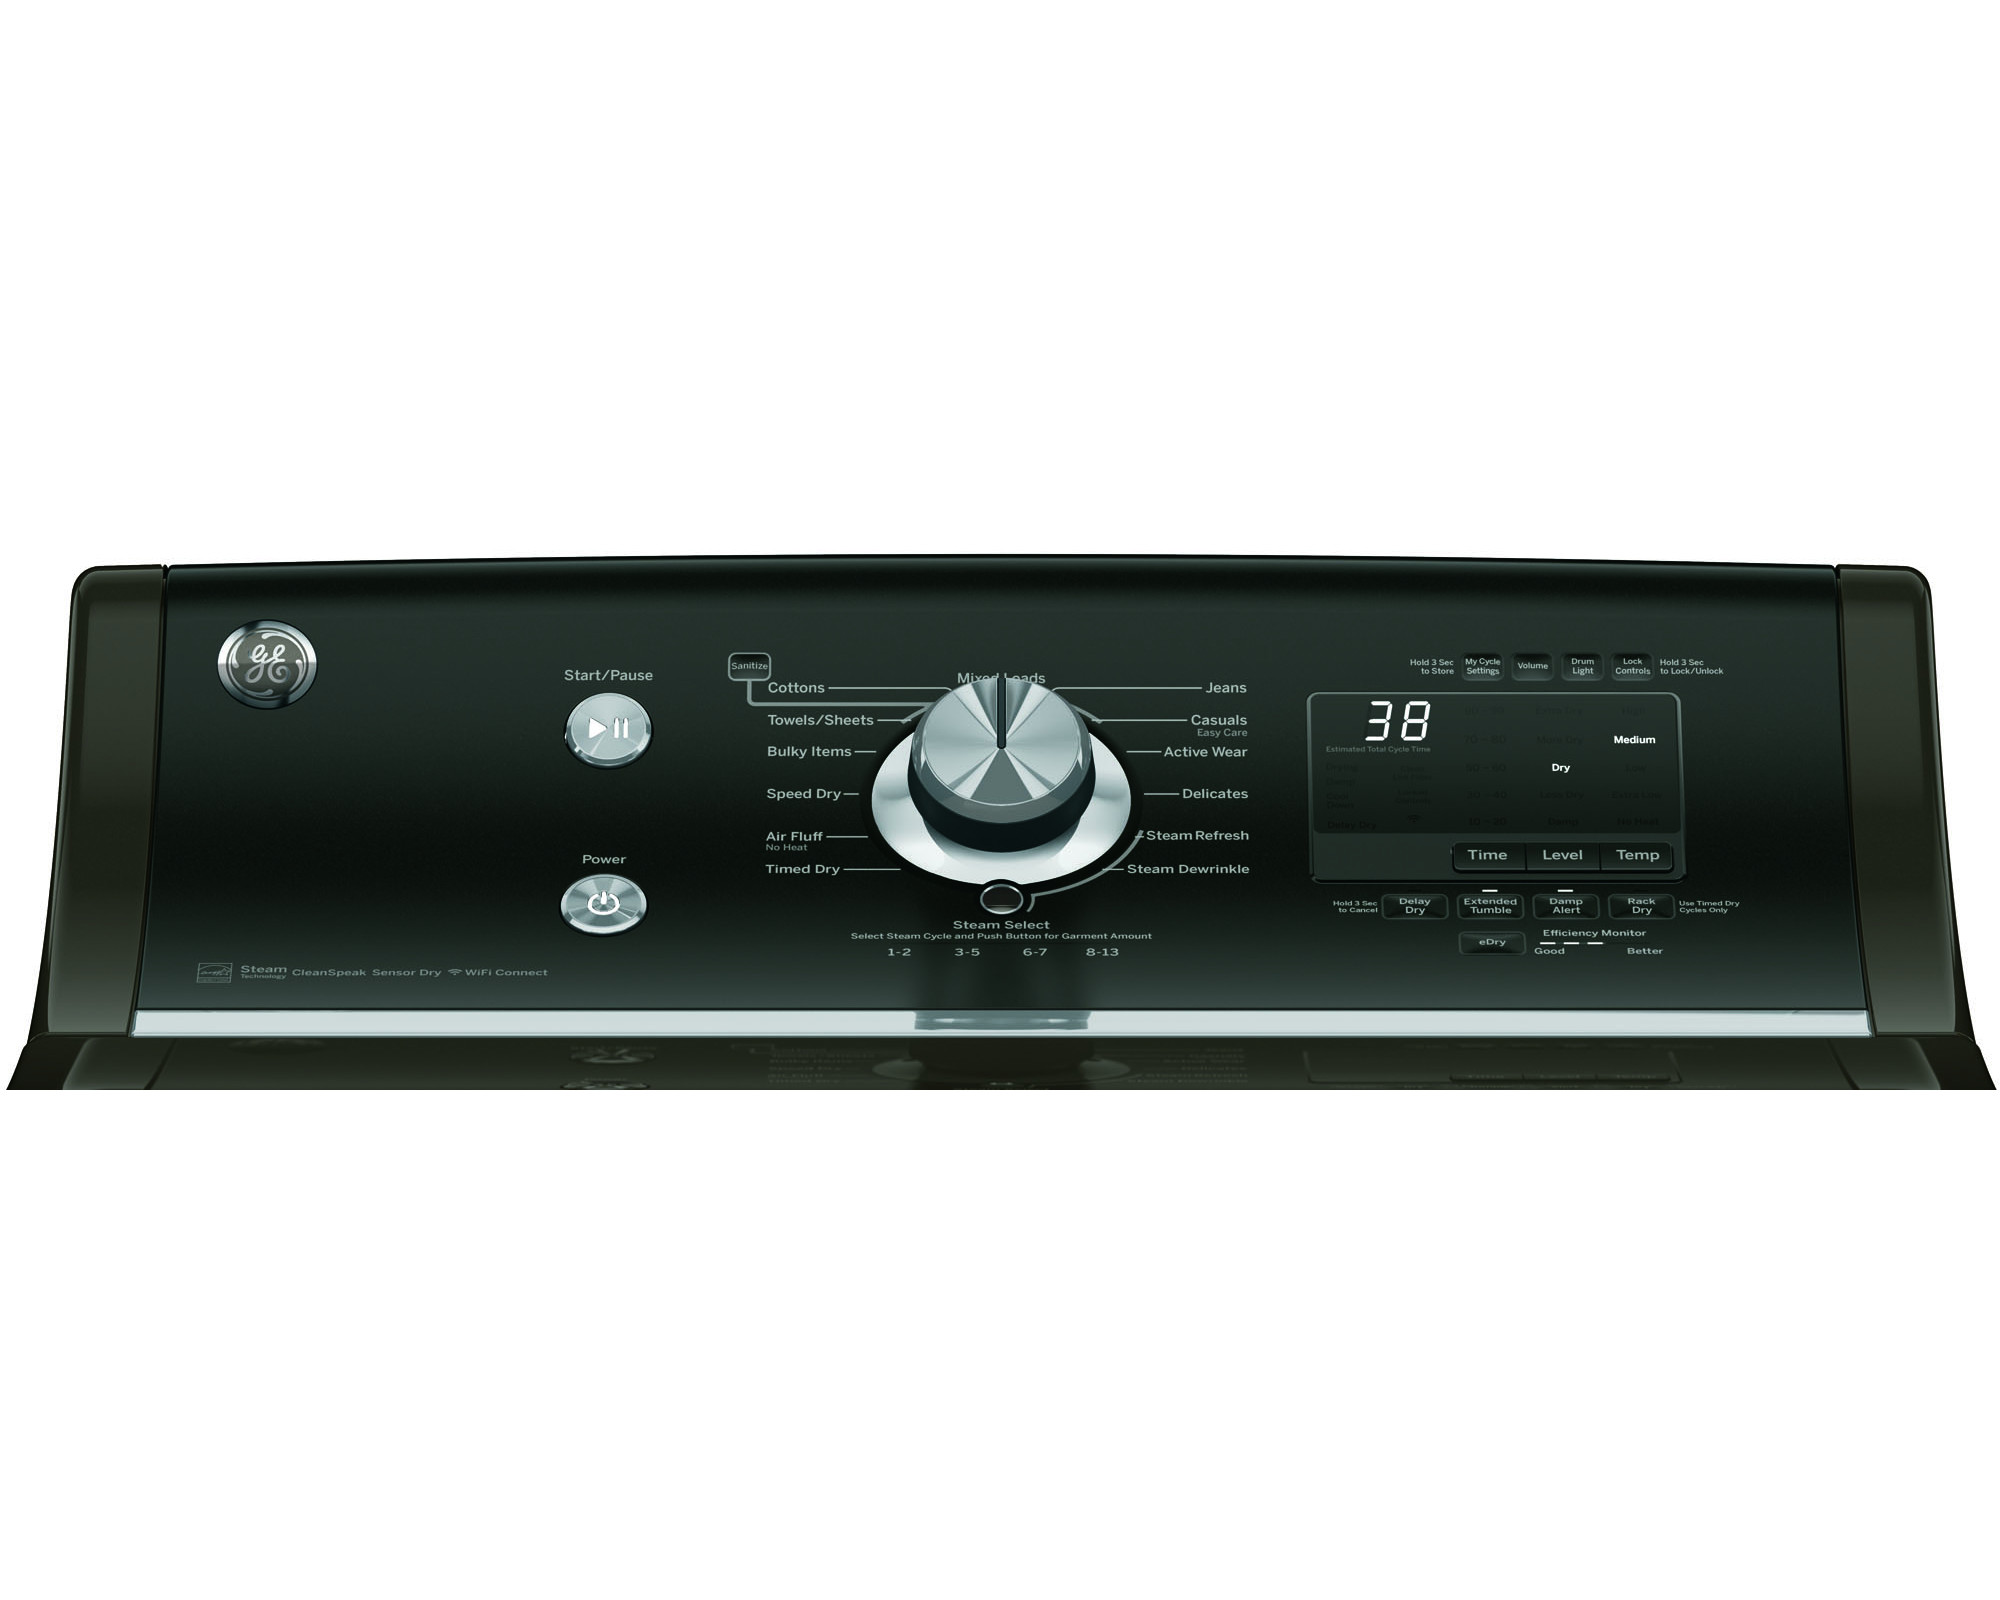 GE Appliances GTD86GSPJMC 7.8 cu. ft. Gas Dryer - Metallic